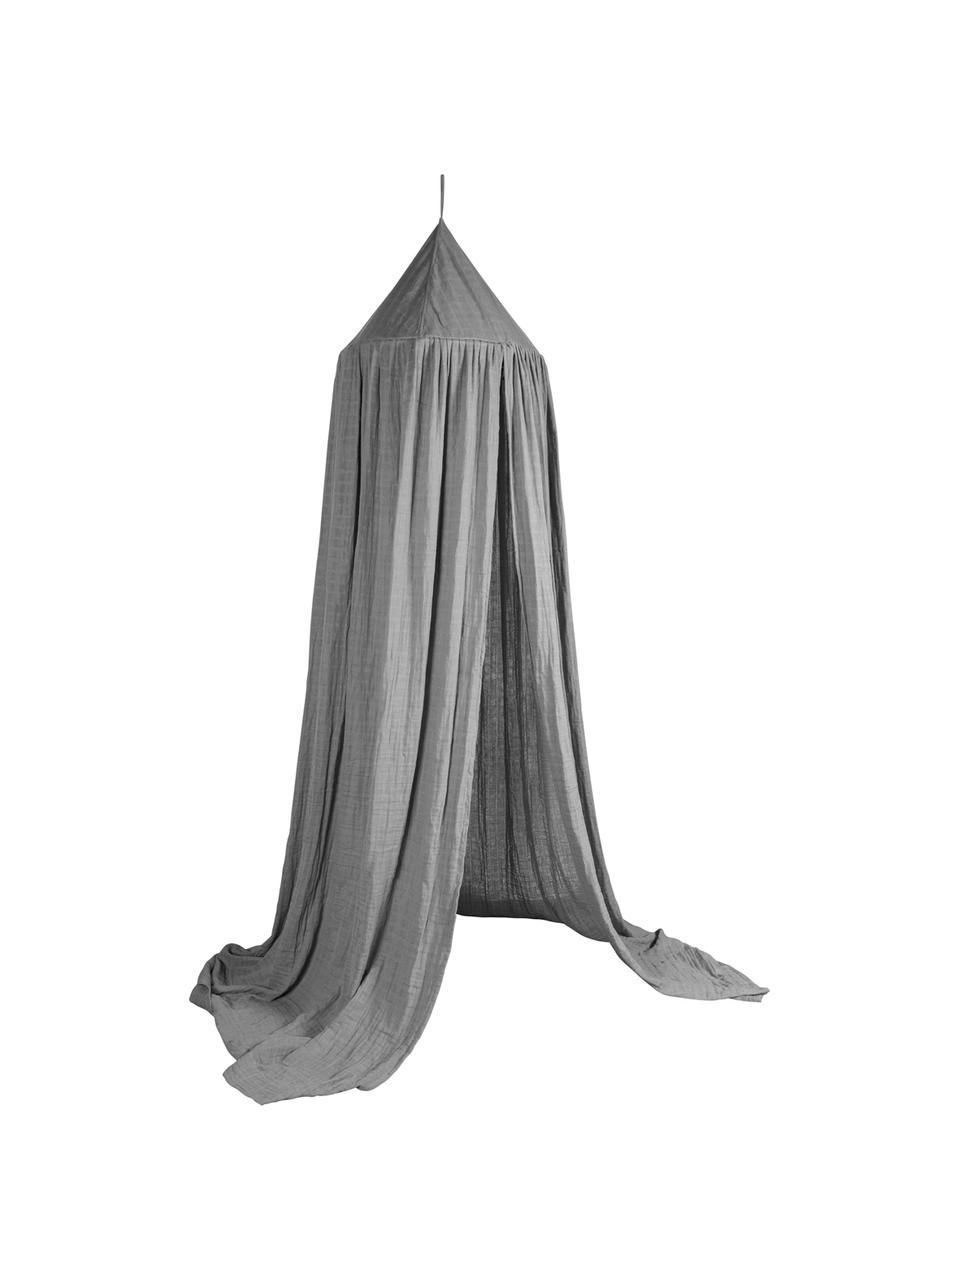 Betthimmel Stars, Bezug: Baumwolle, Grau, Ø 50 x H 240 cm